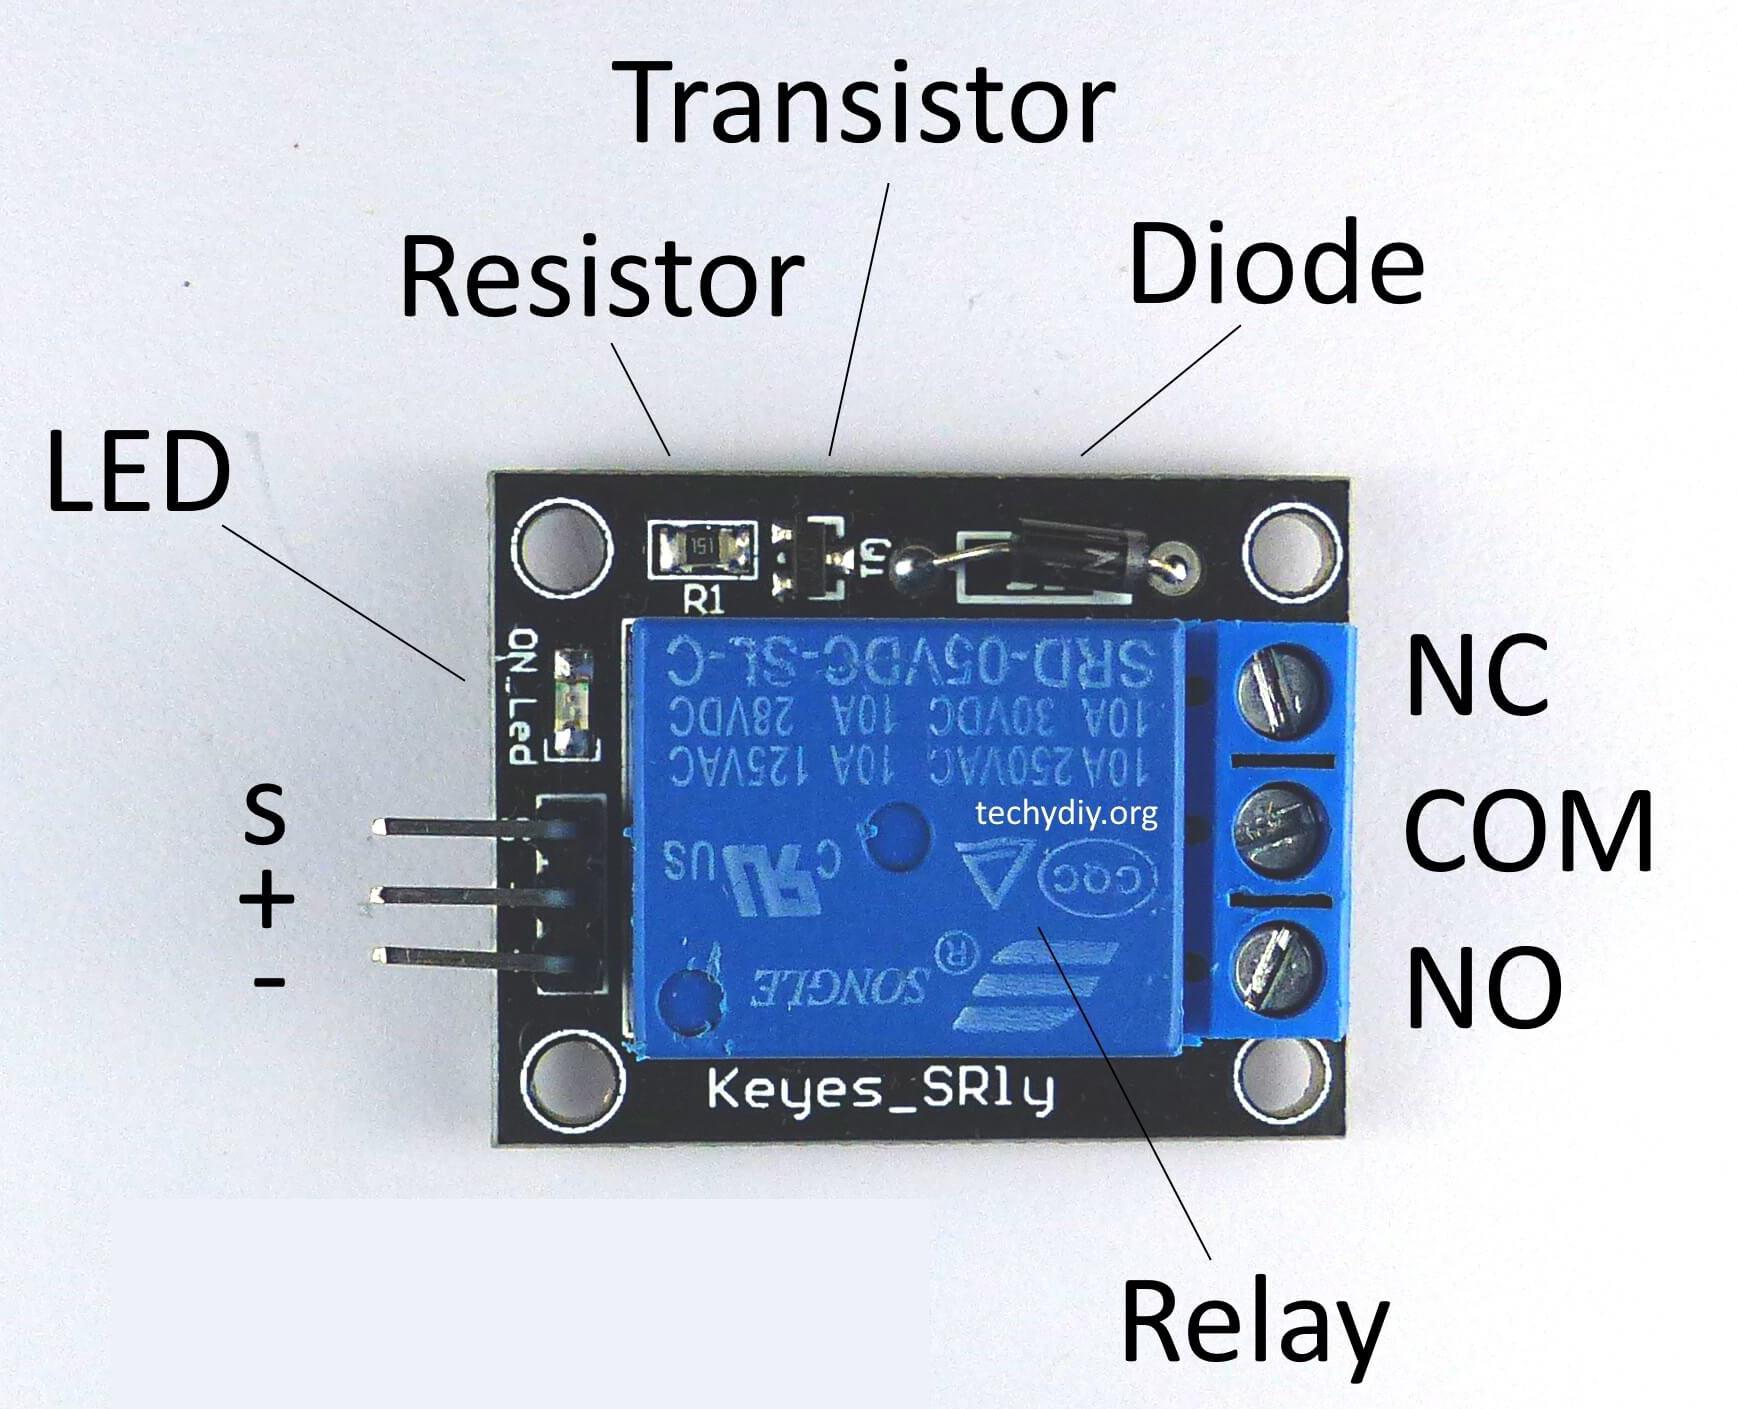 Srd-05Vdc-Sl-C Wiring Diagram from image.sciencenet.cn